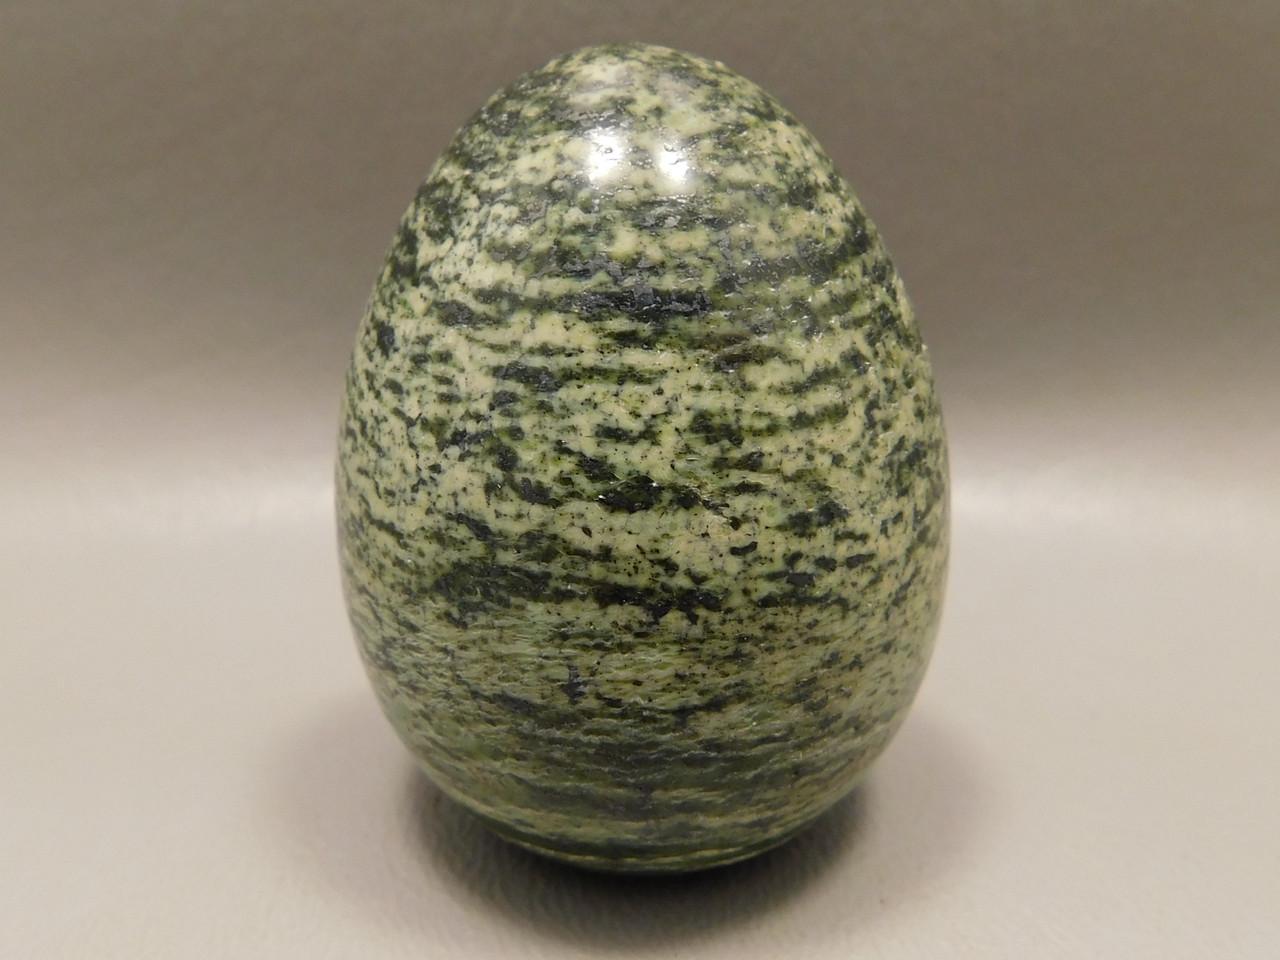 Serpentine Stone Egg 2 inch Green Gemstone South Africa Rock #O2